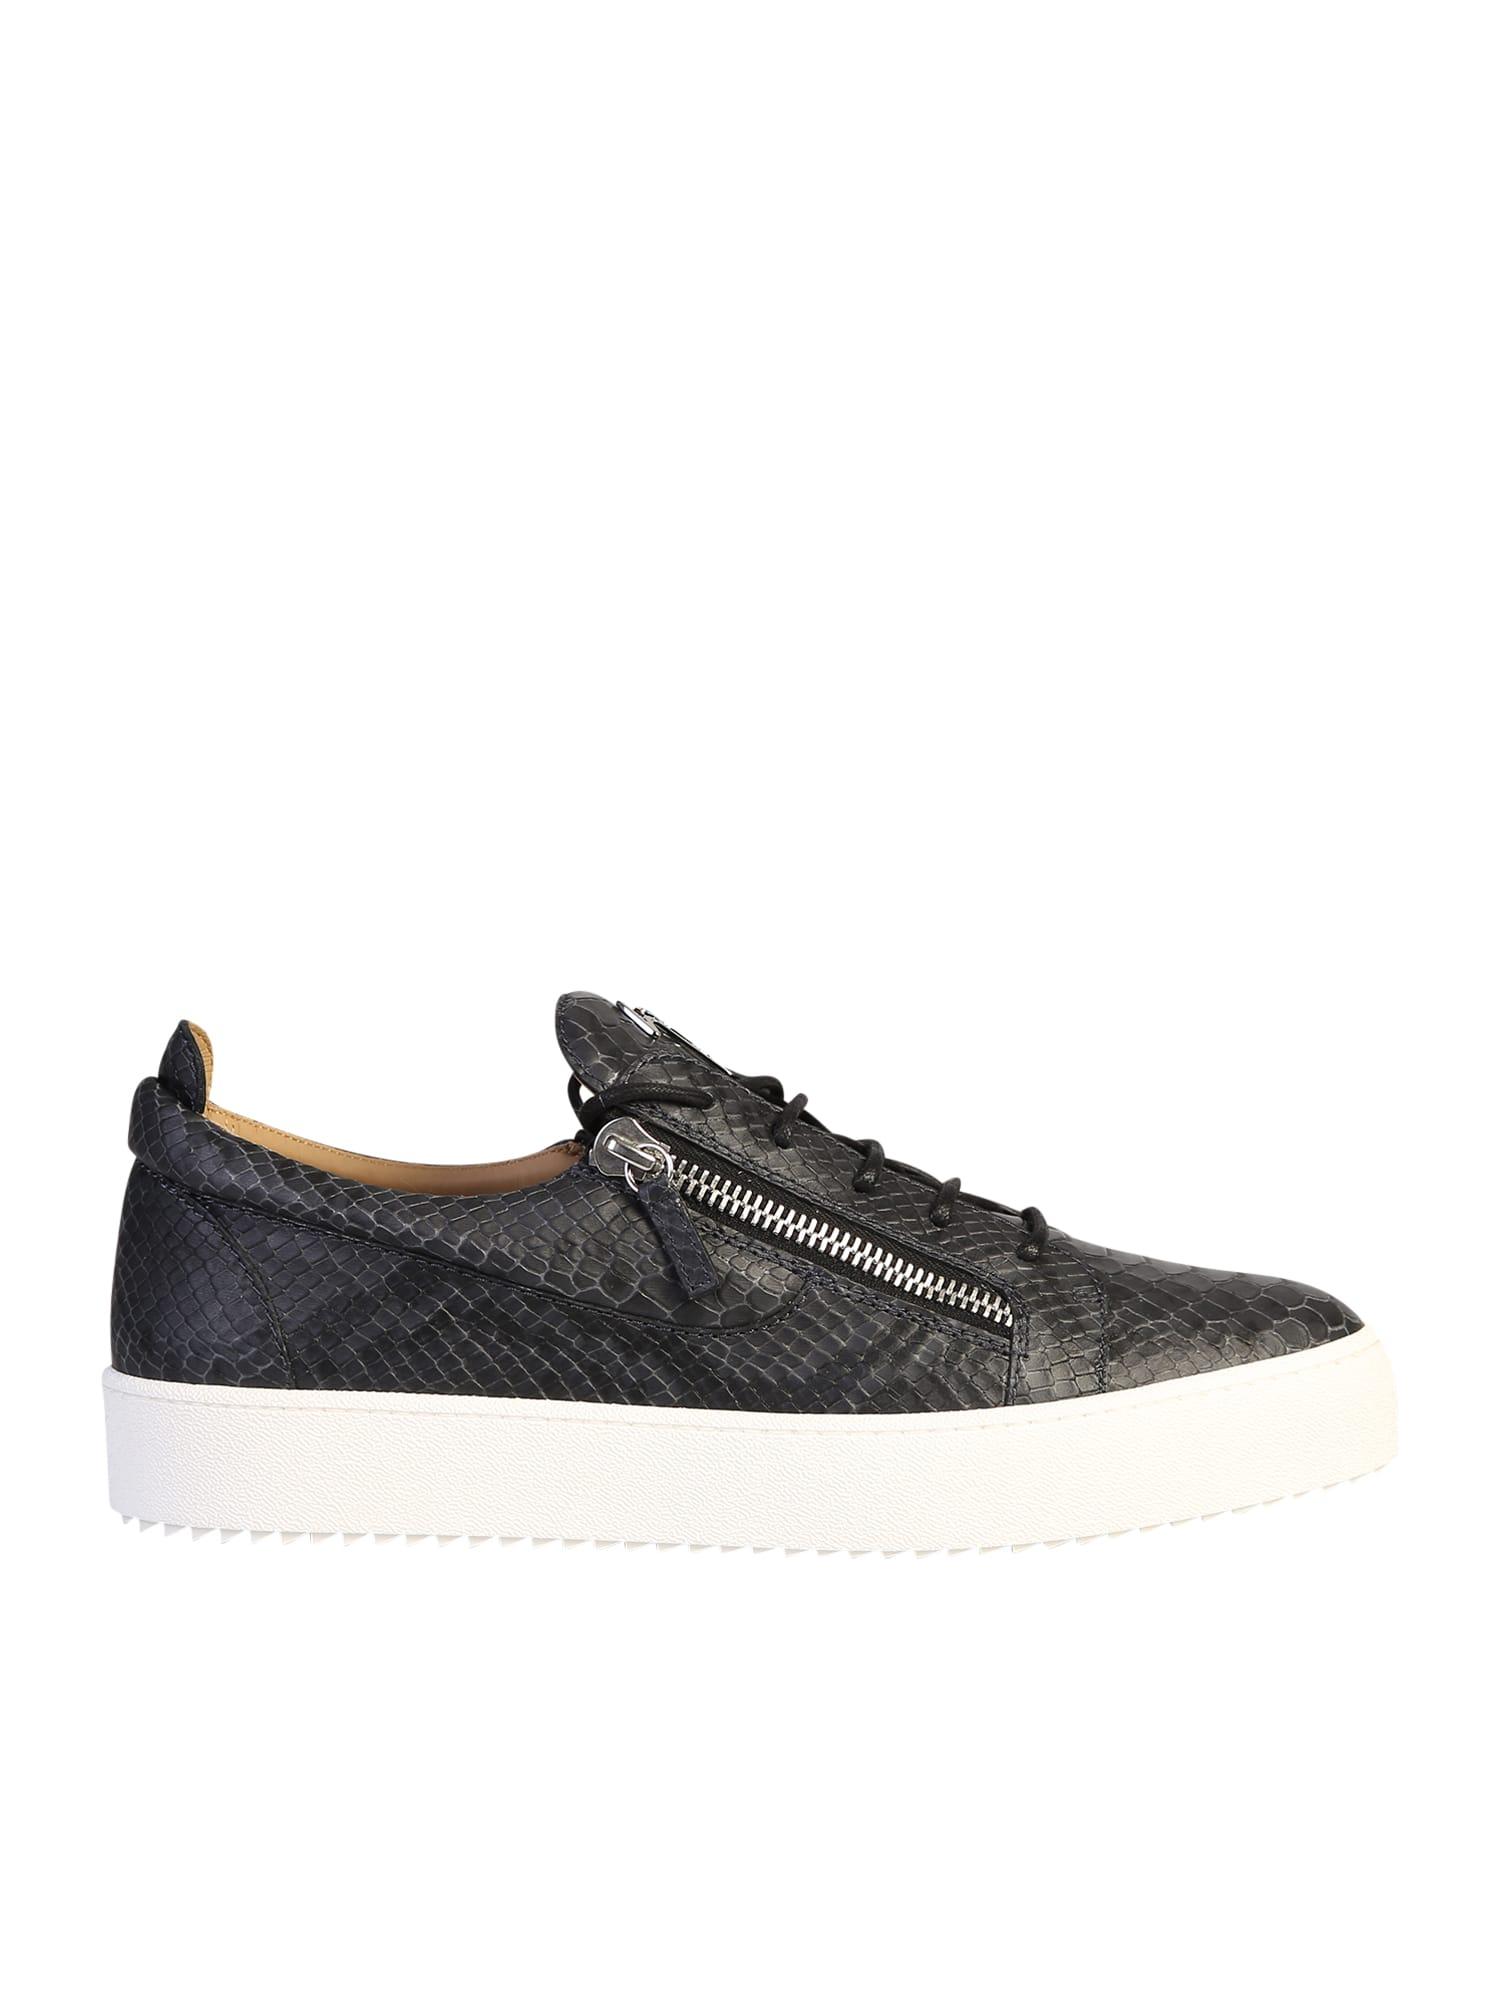 Giuseppe Zanotti Animalier Print Sneakers